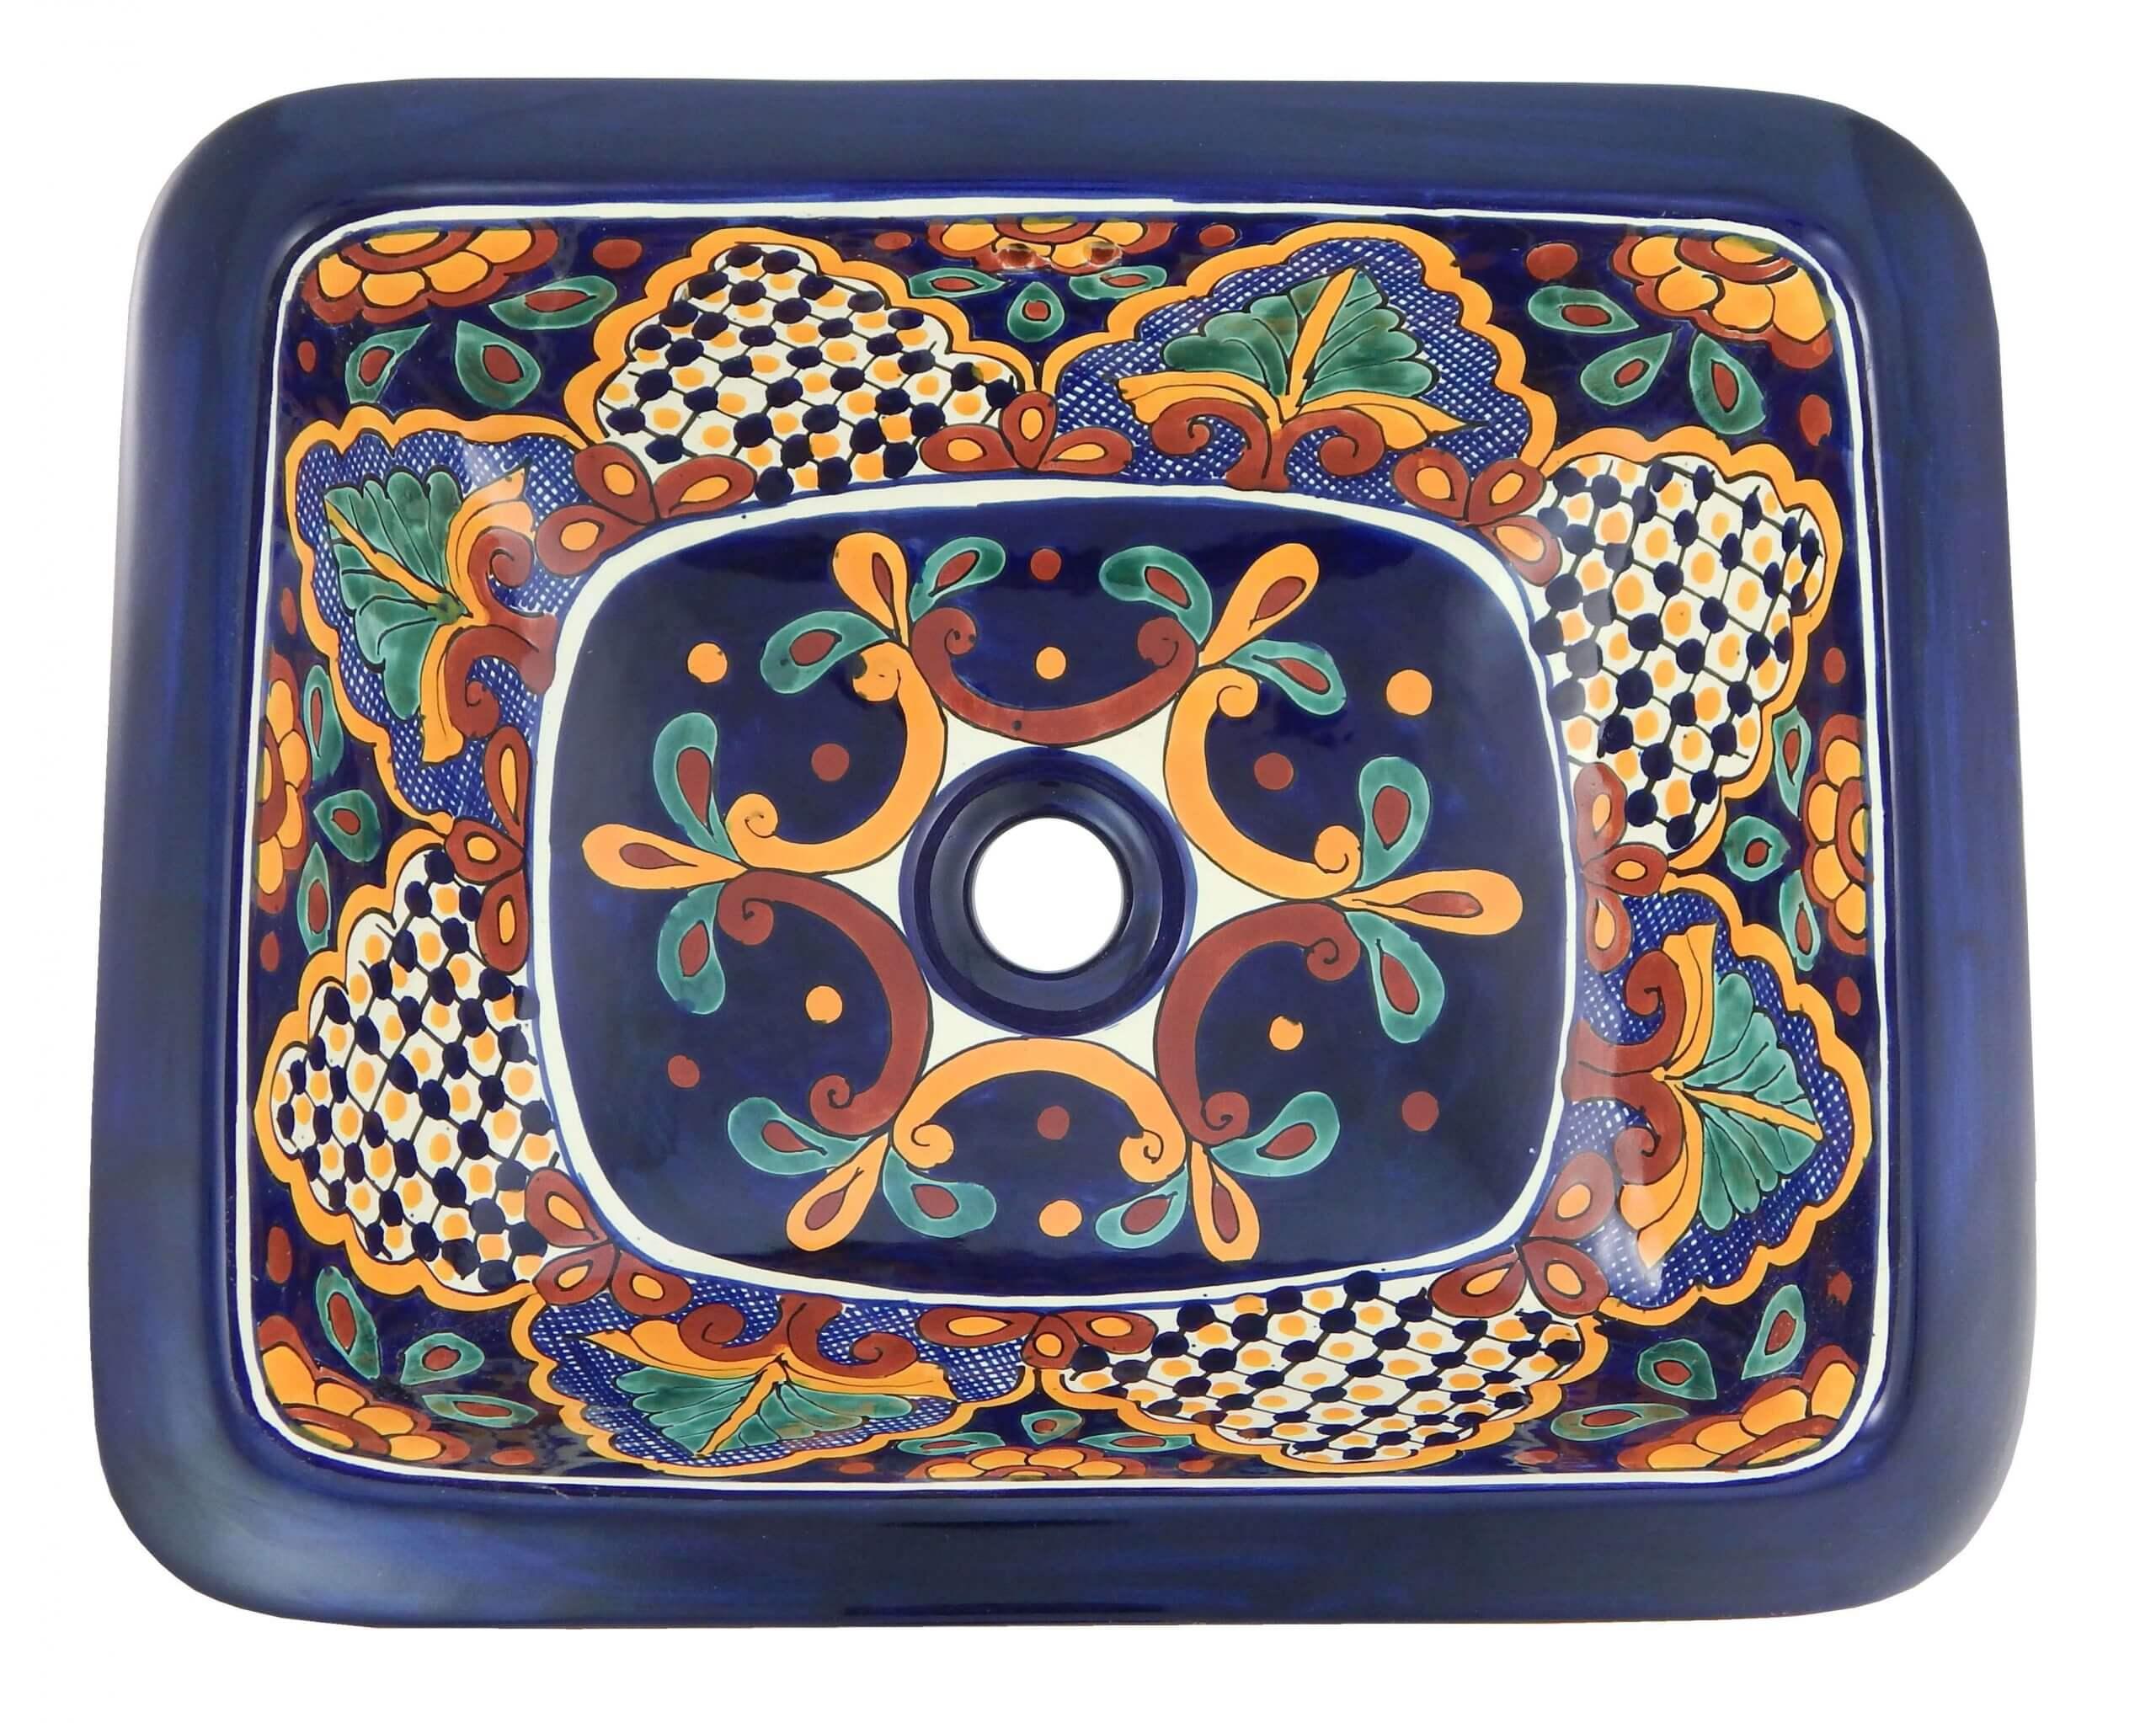 Santa Fe Bathroom Ceramic Oval Talavera Sink